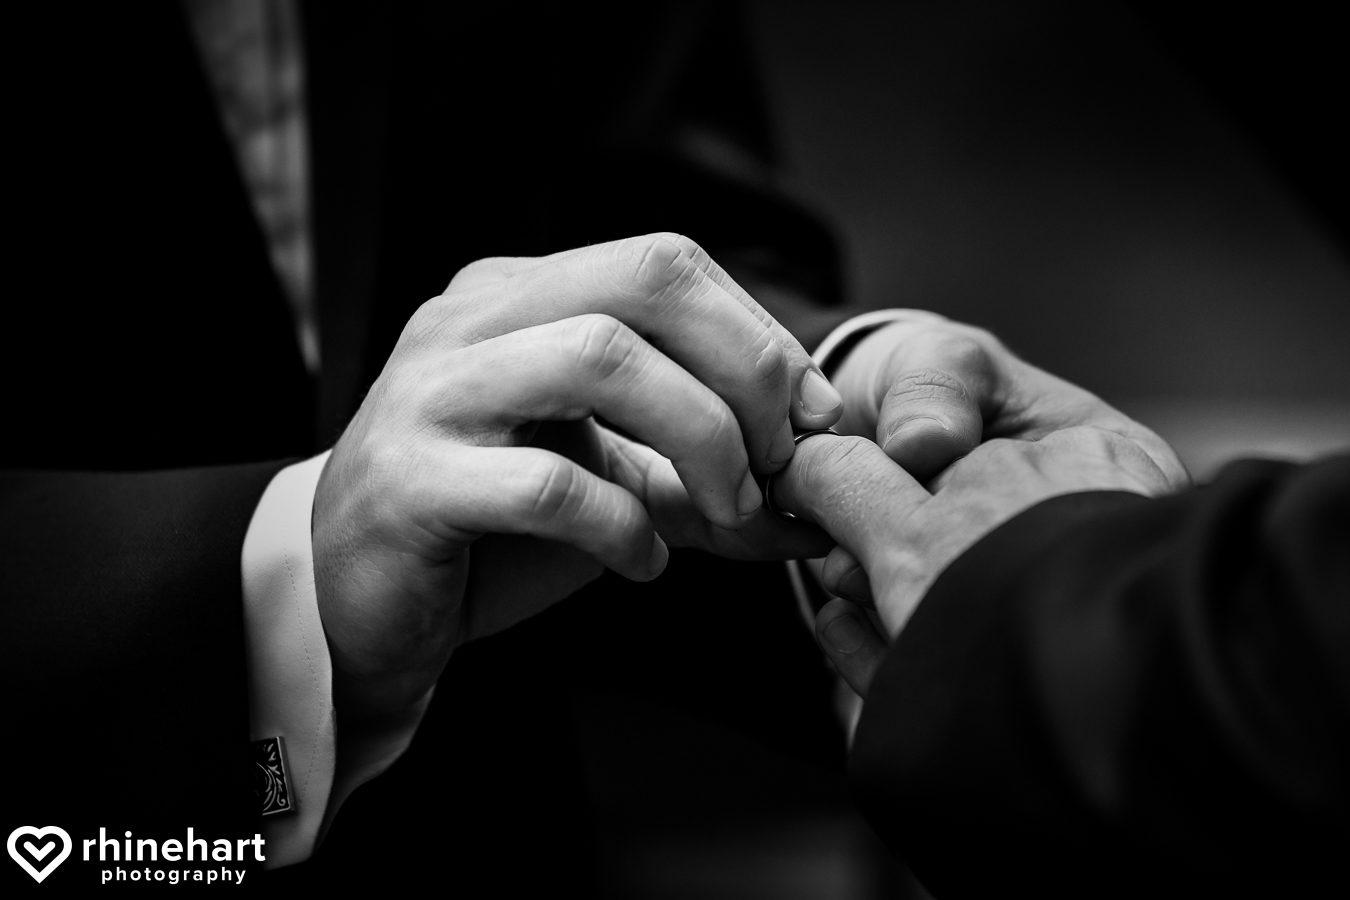 ledges-hotel-wedding-photographers-poconos-hawley-pa-best-creative-unique-artistic-fun-romantic-241